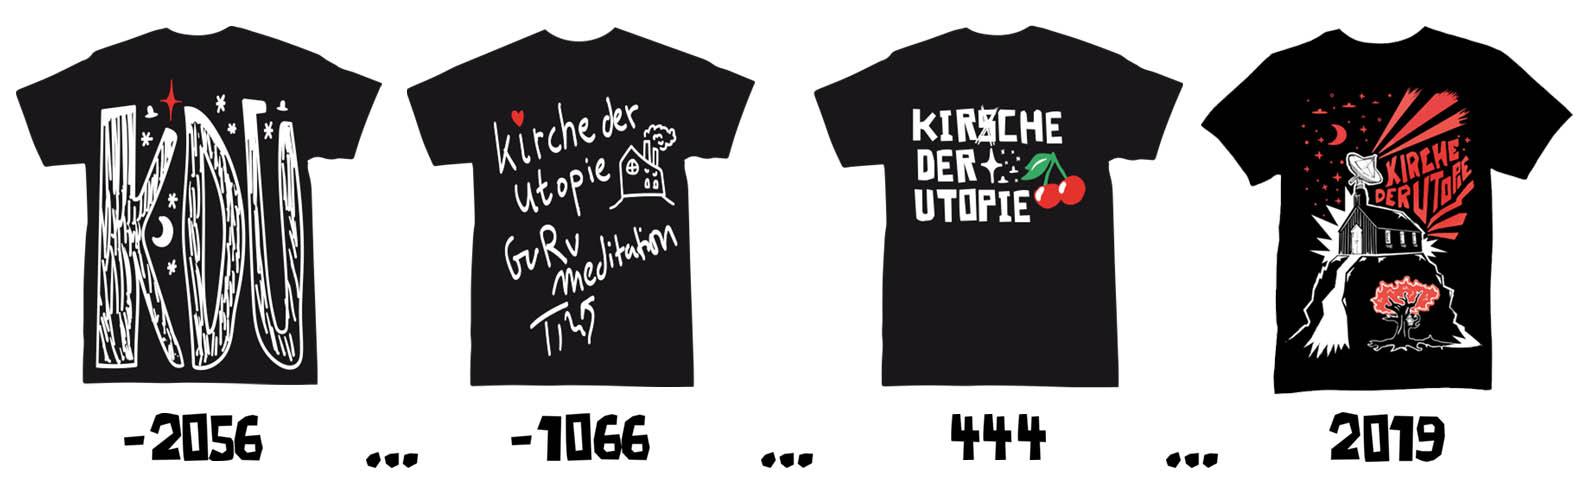 shirt-history-kirche